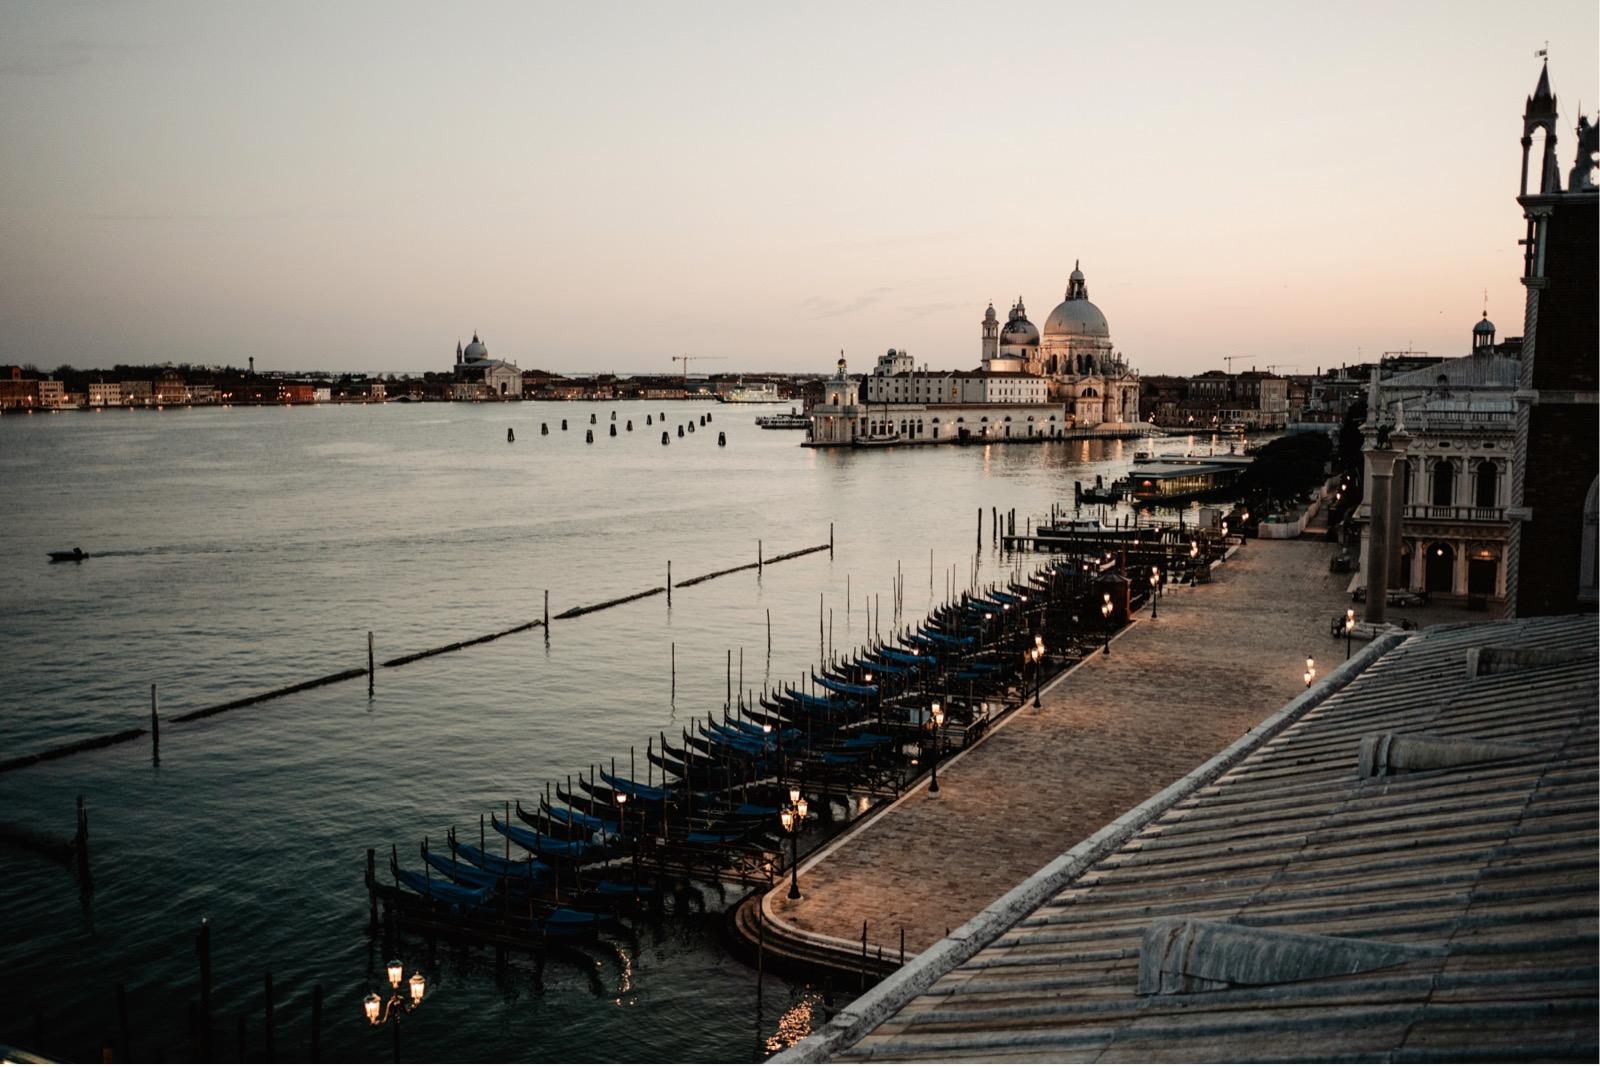 wedding proposal at hotel danieli Venice